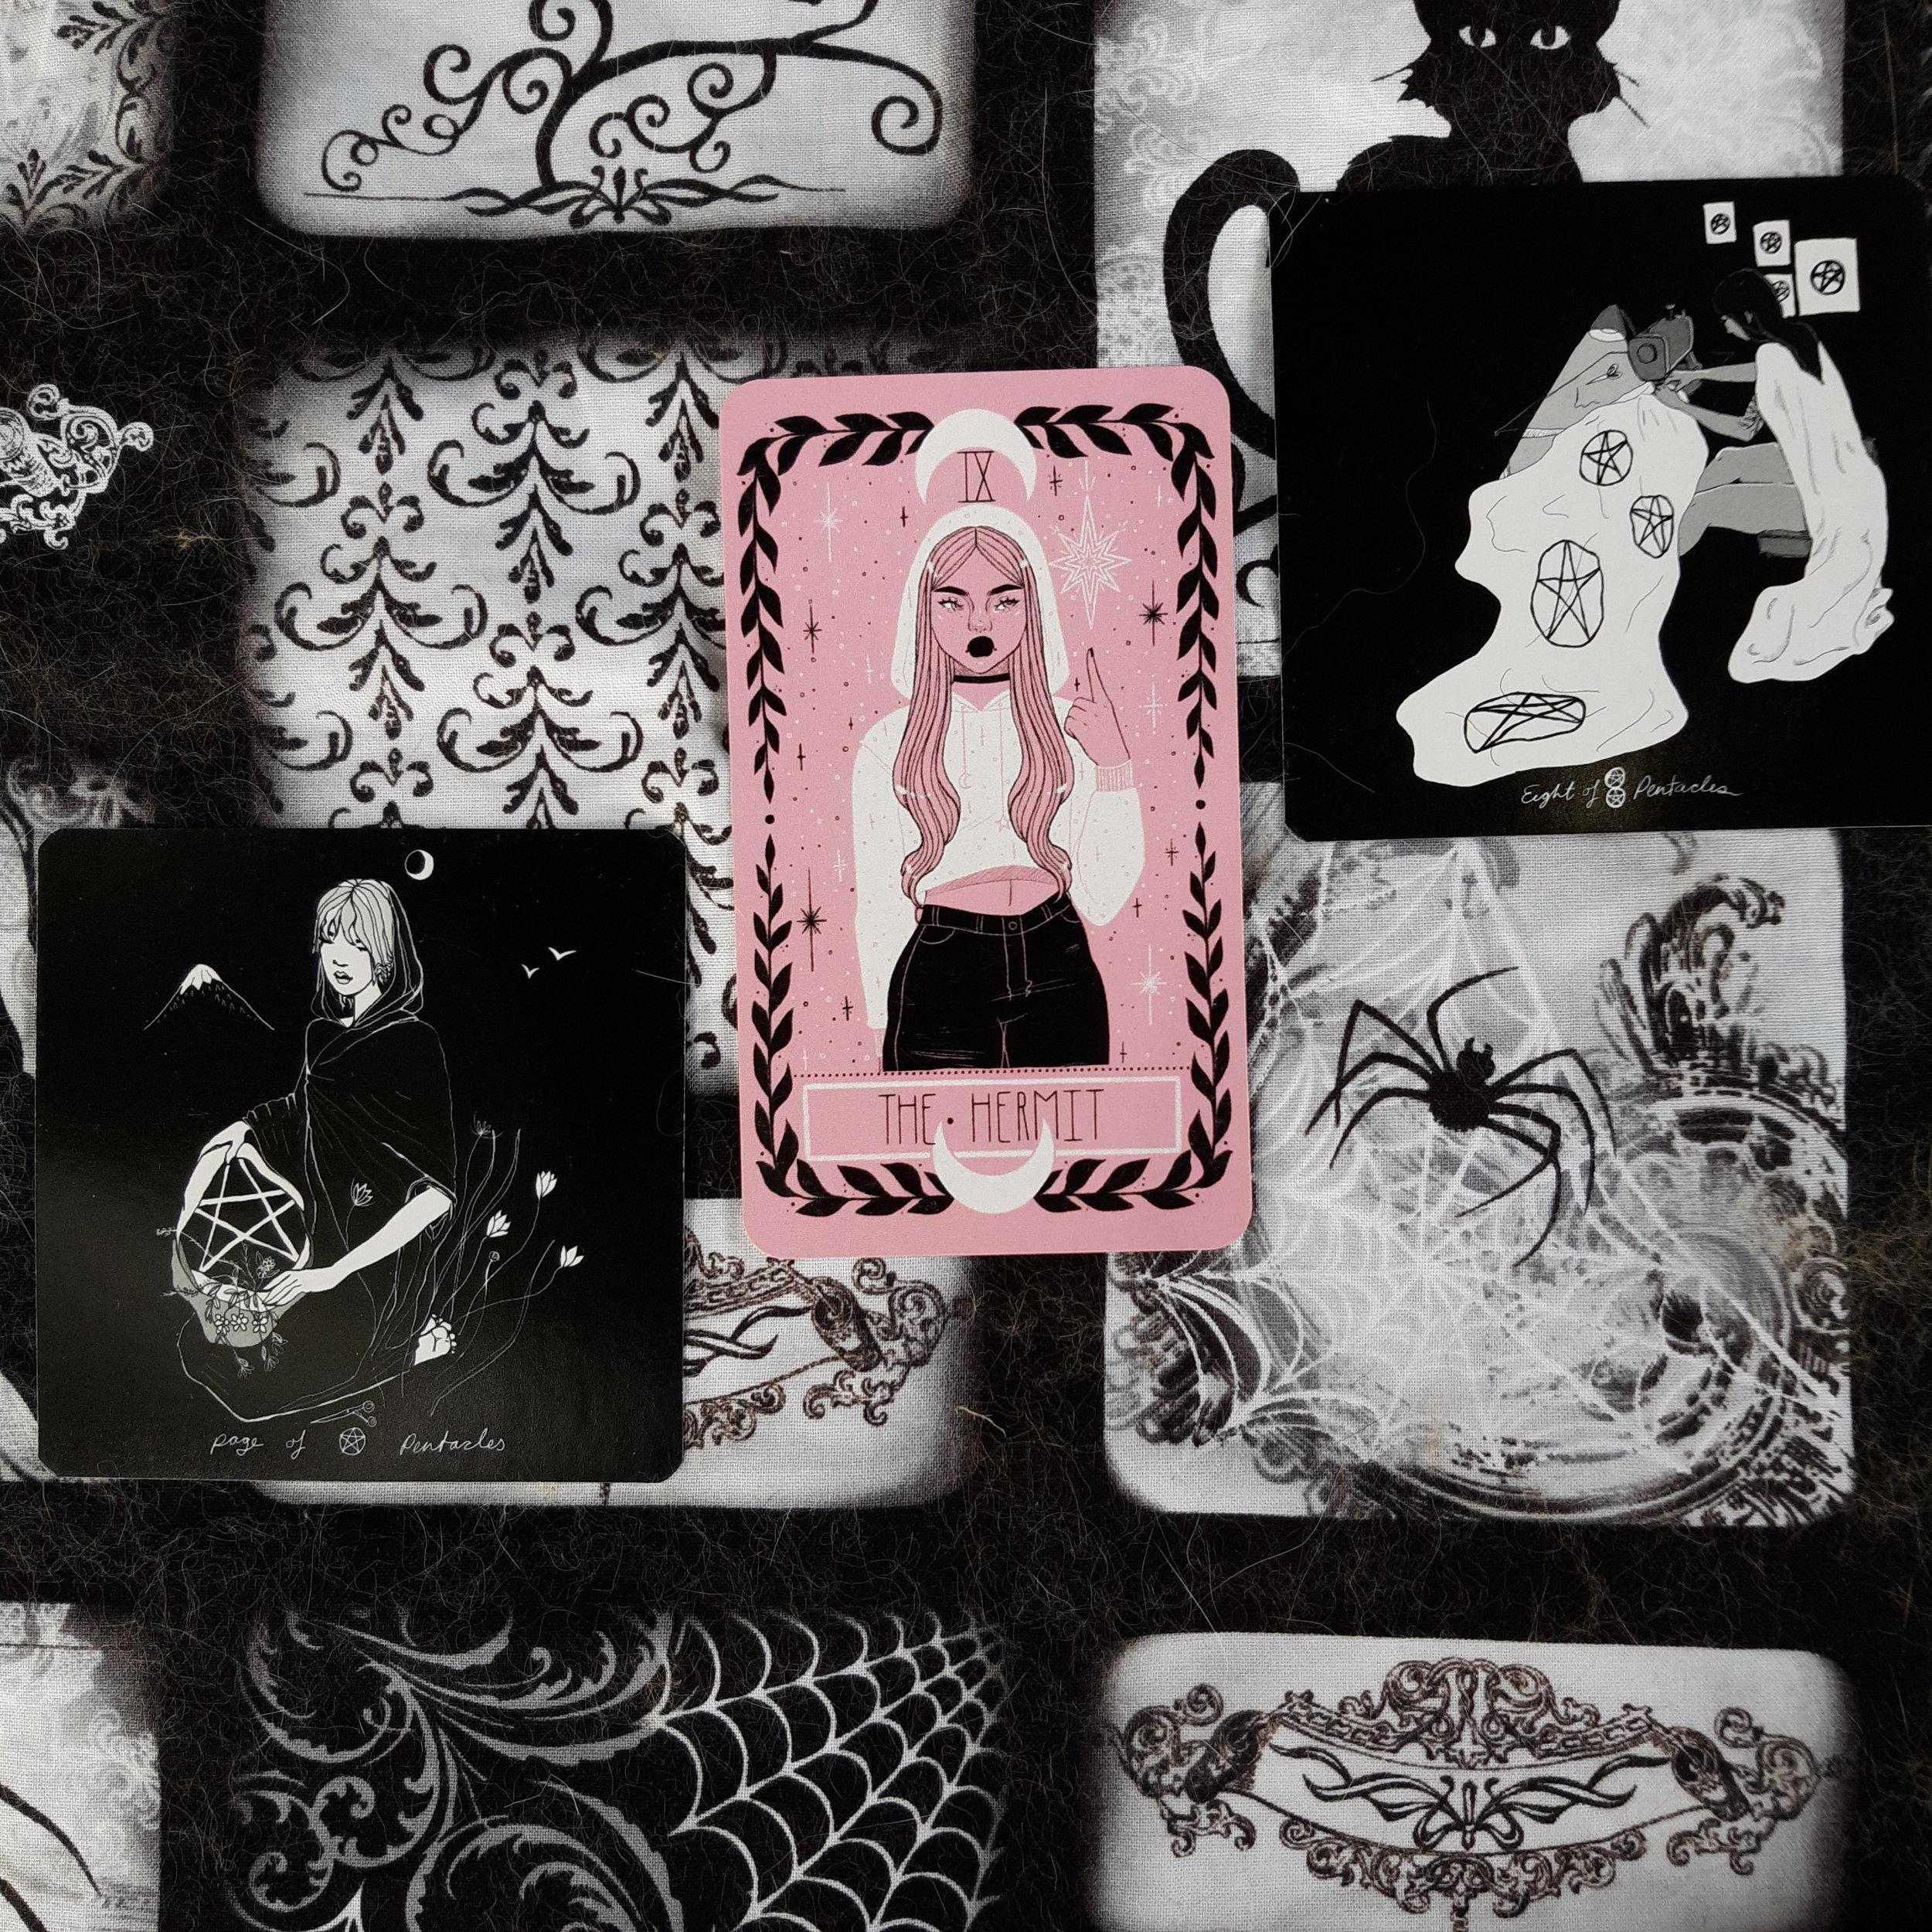 The Lovely Omens Tarot and the Dark Days Tarot